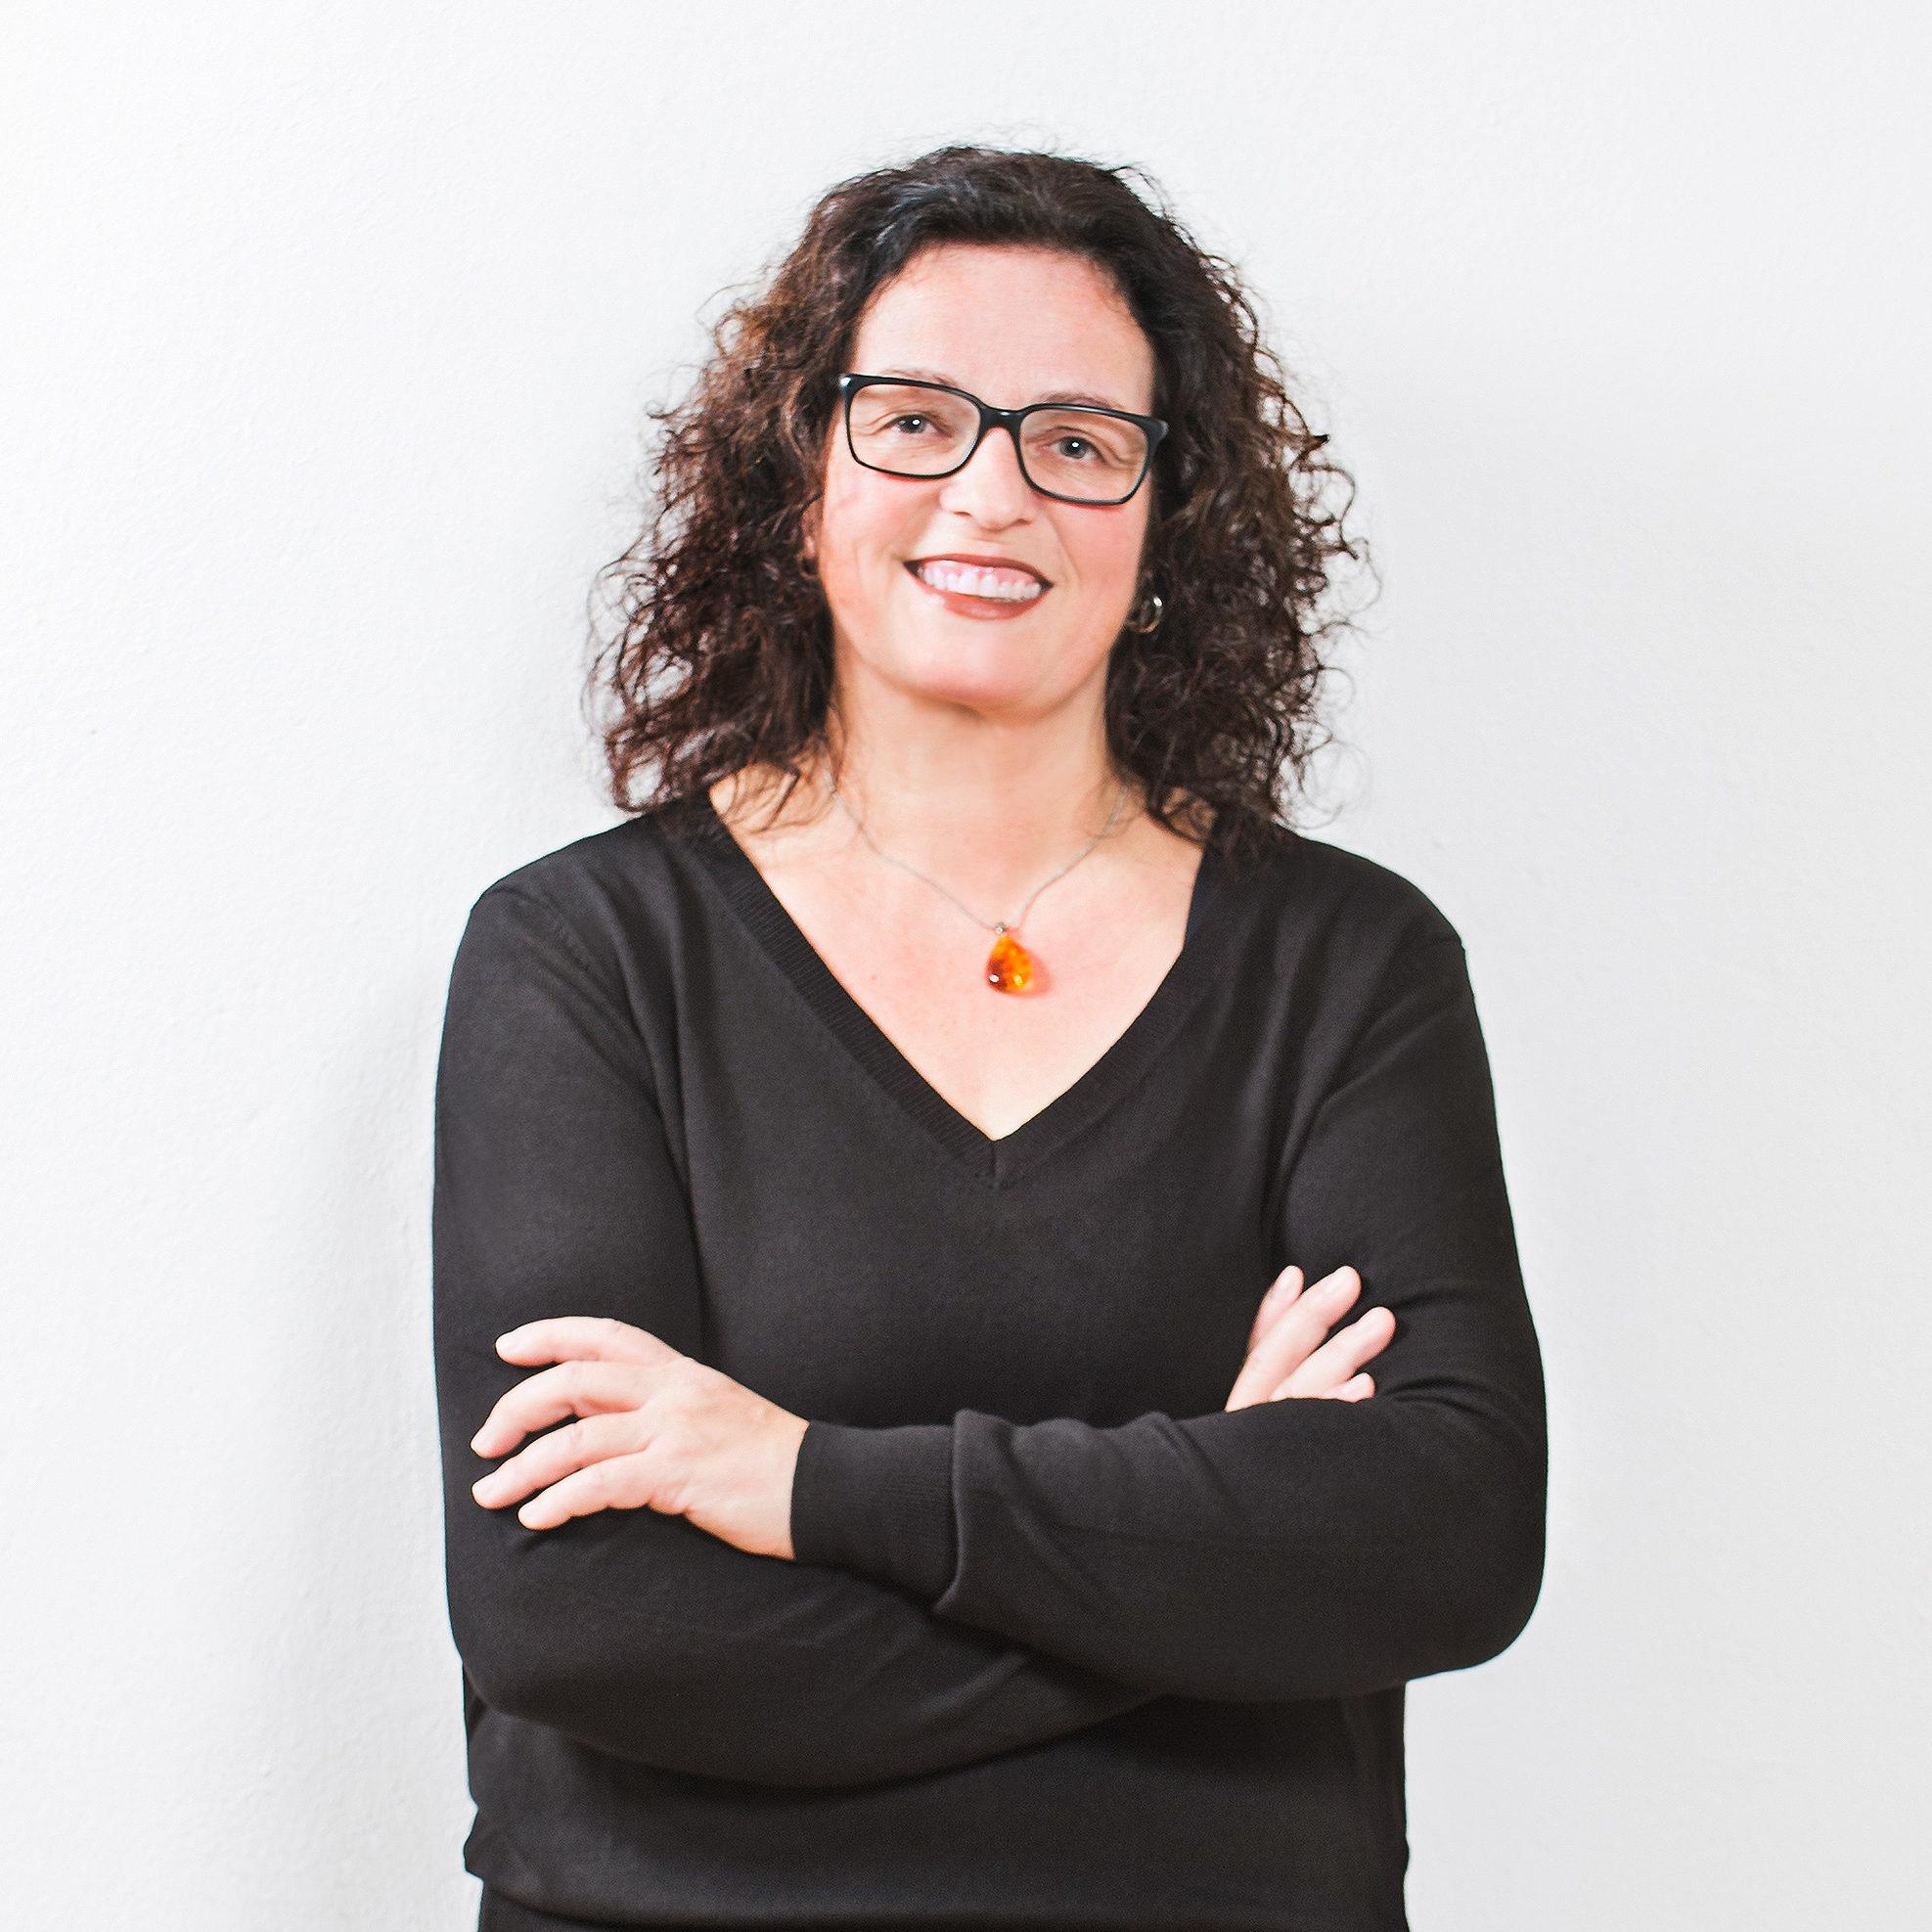 Astrid Kettern